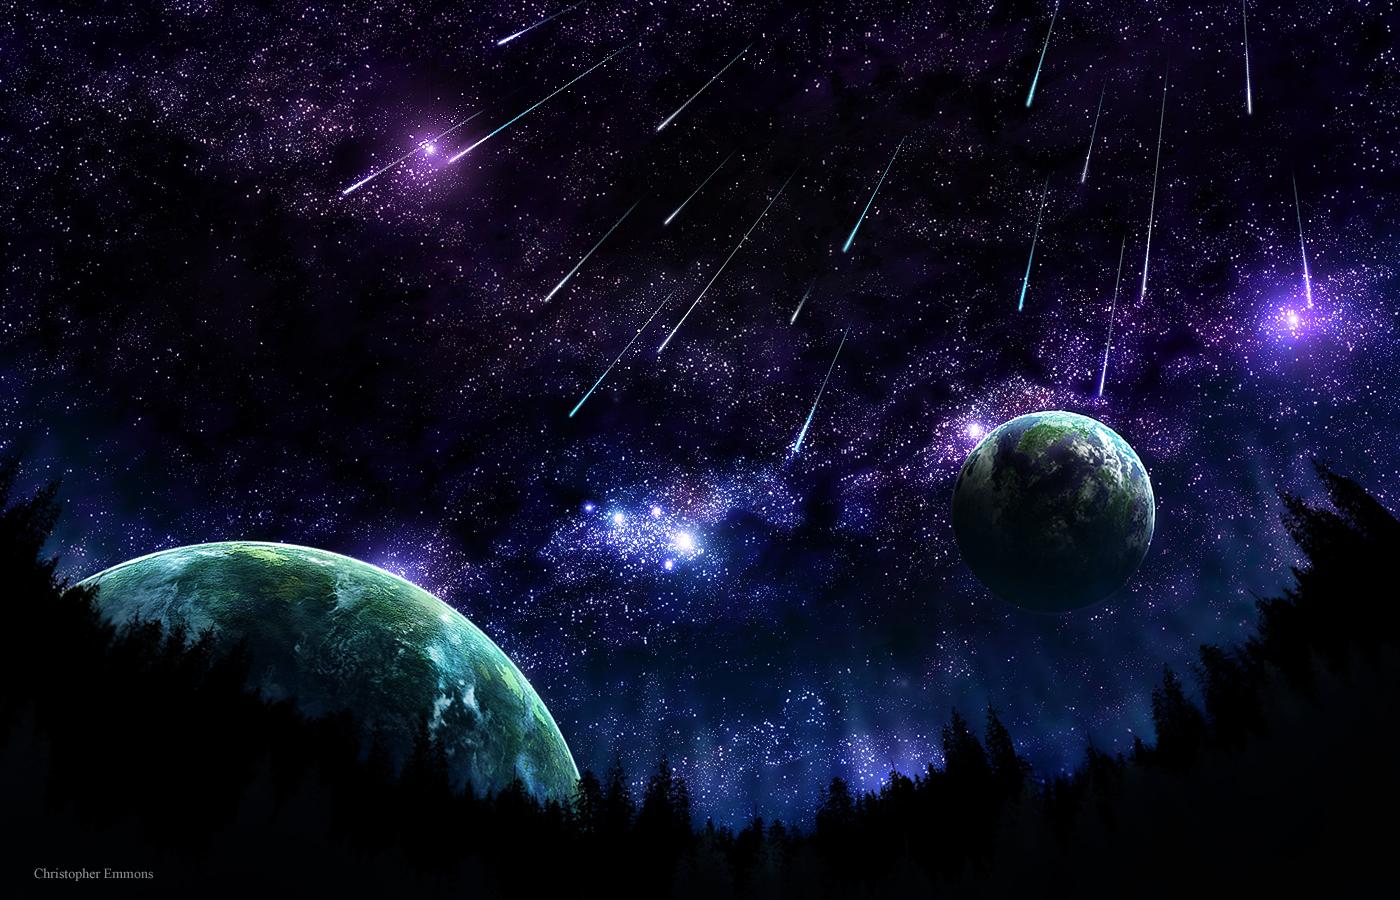 Star_Gazing_by_Bareck